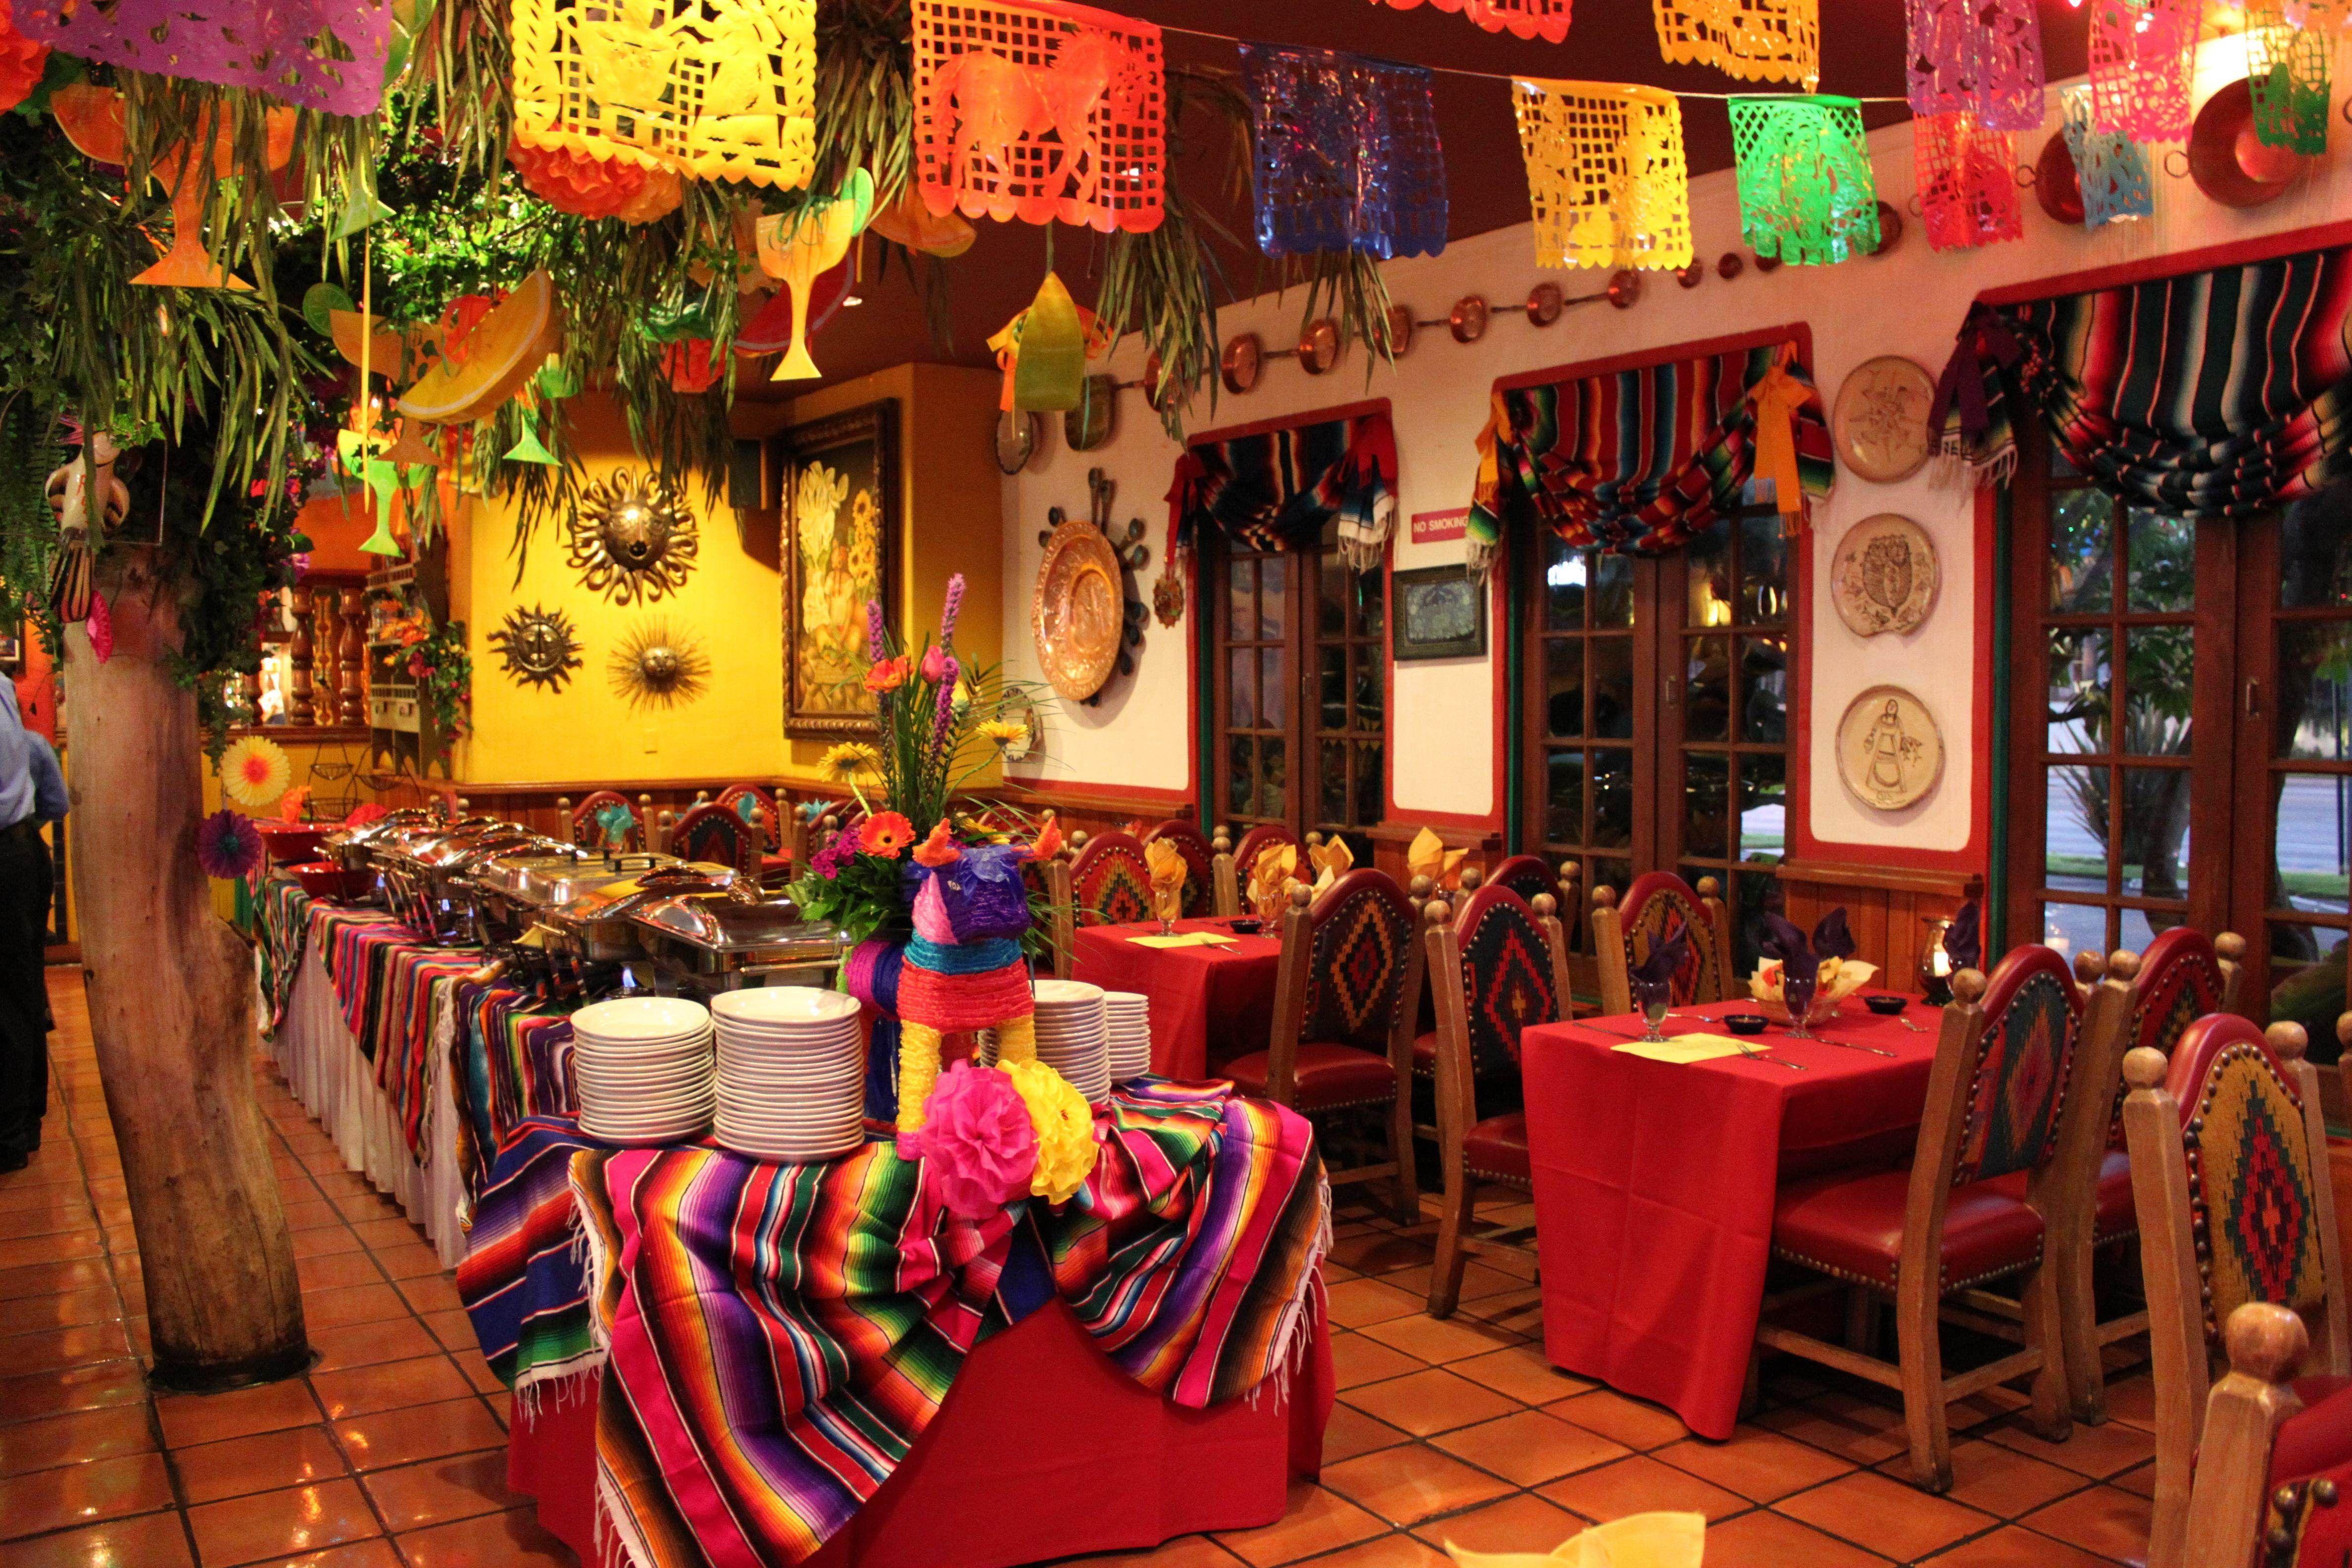 Cantina fiesta pinterest cantinas decoraciones for Ideas decoracion restaurante